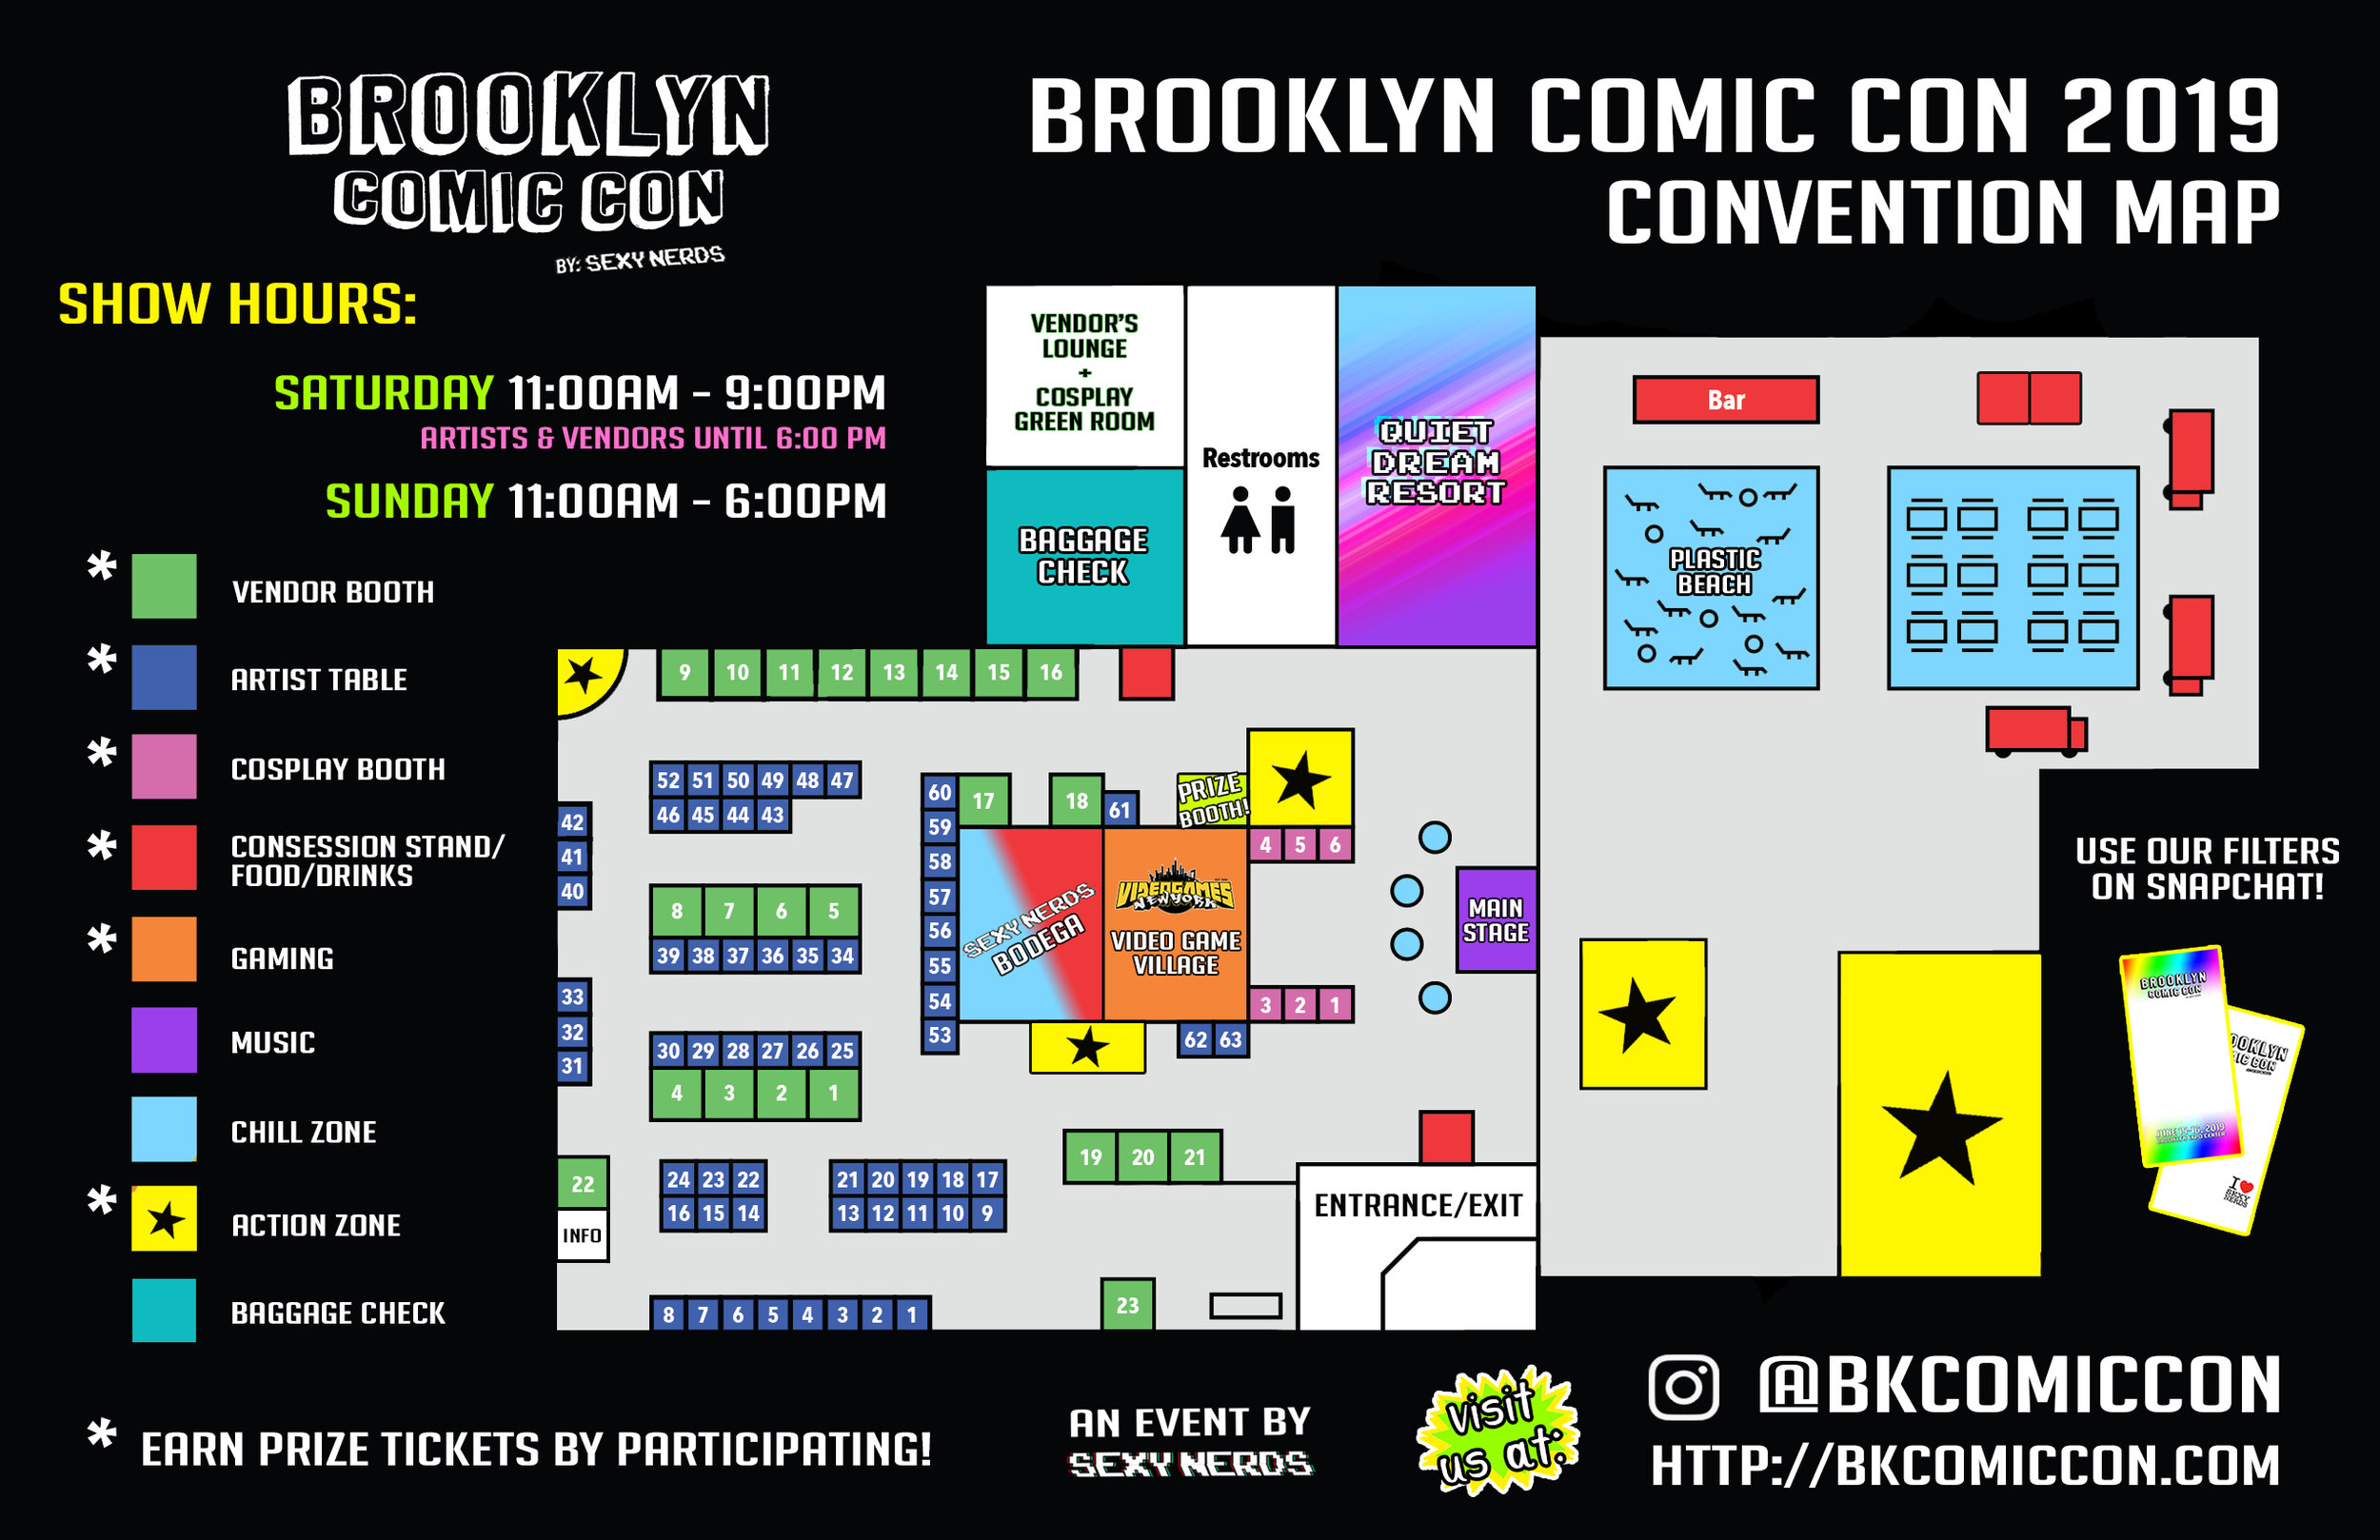 bkcomiccon final floorplan 3.jpg